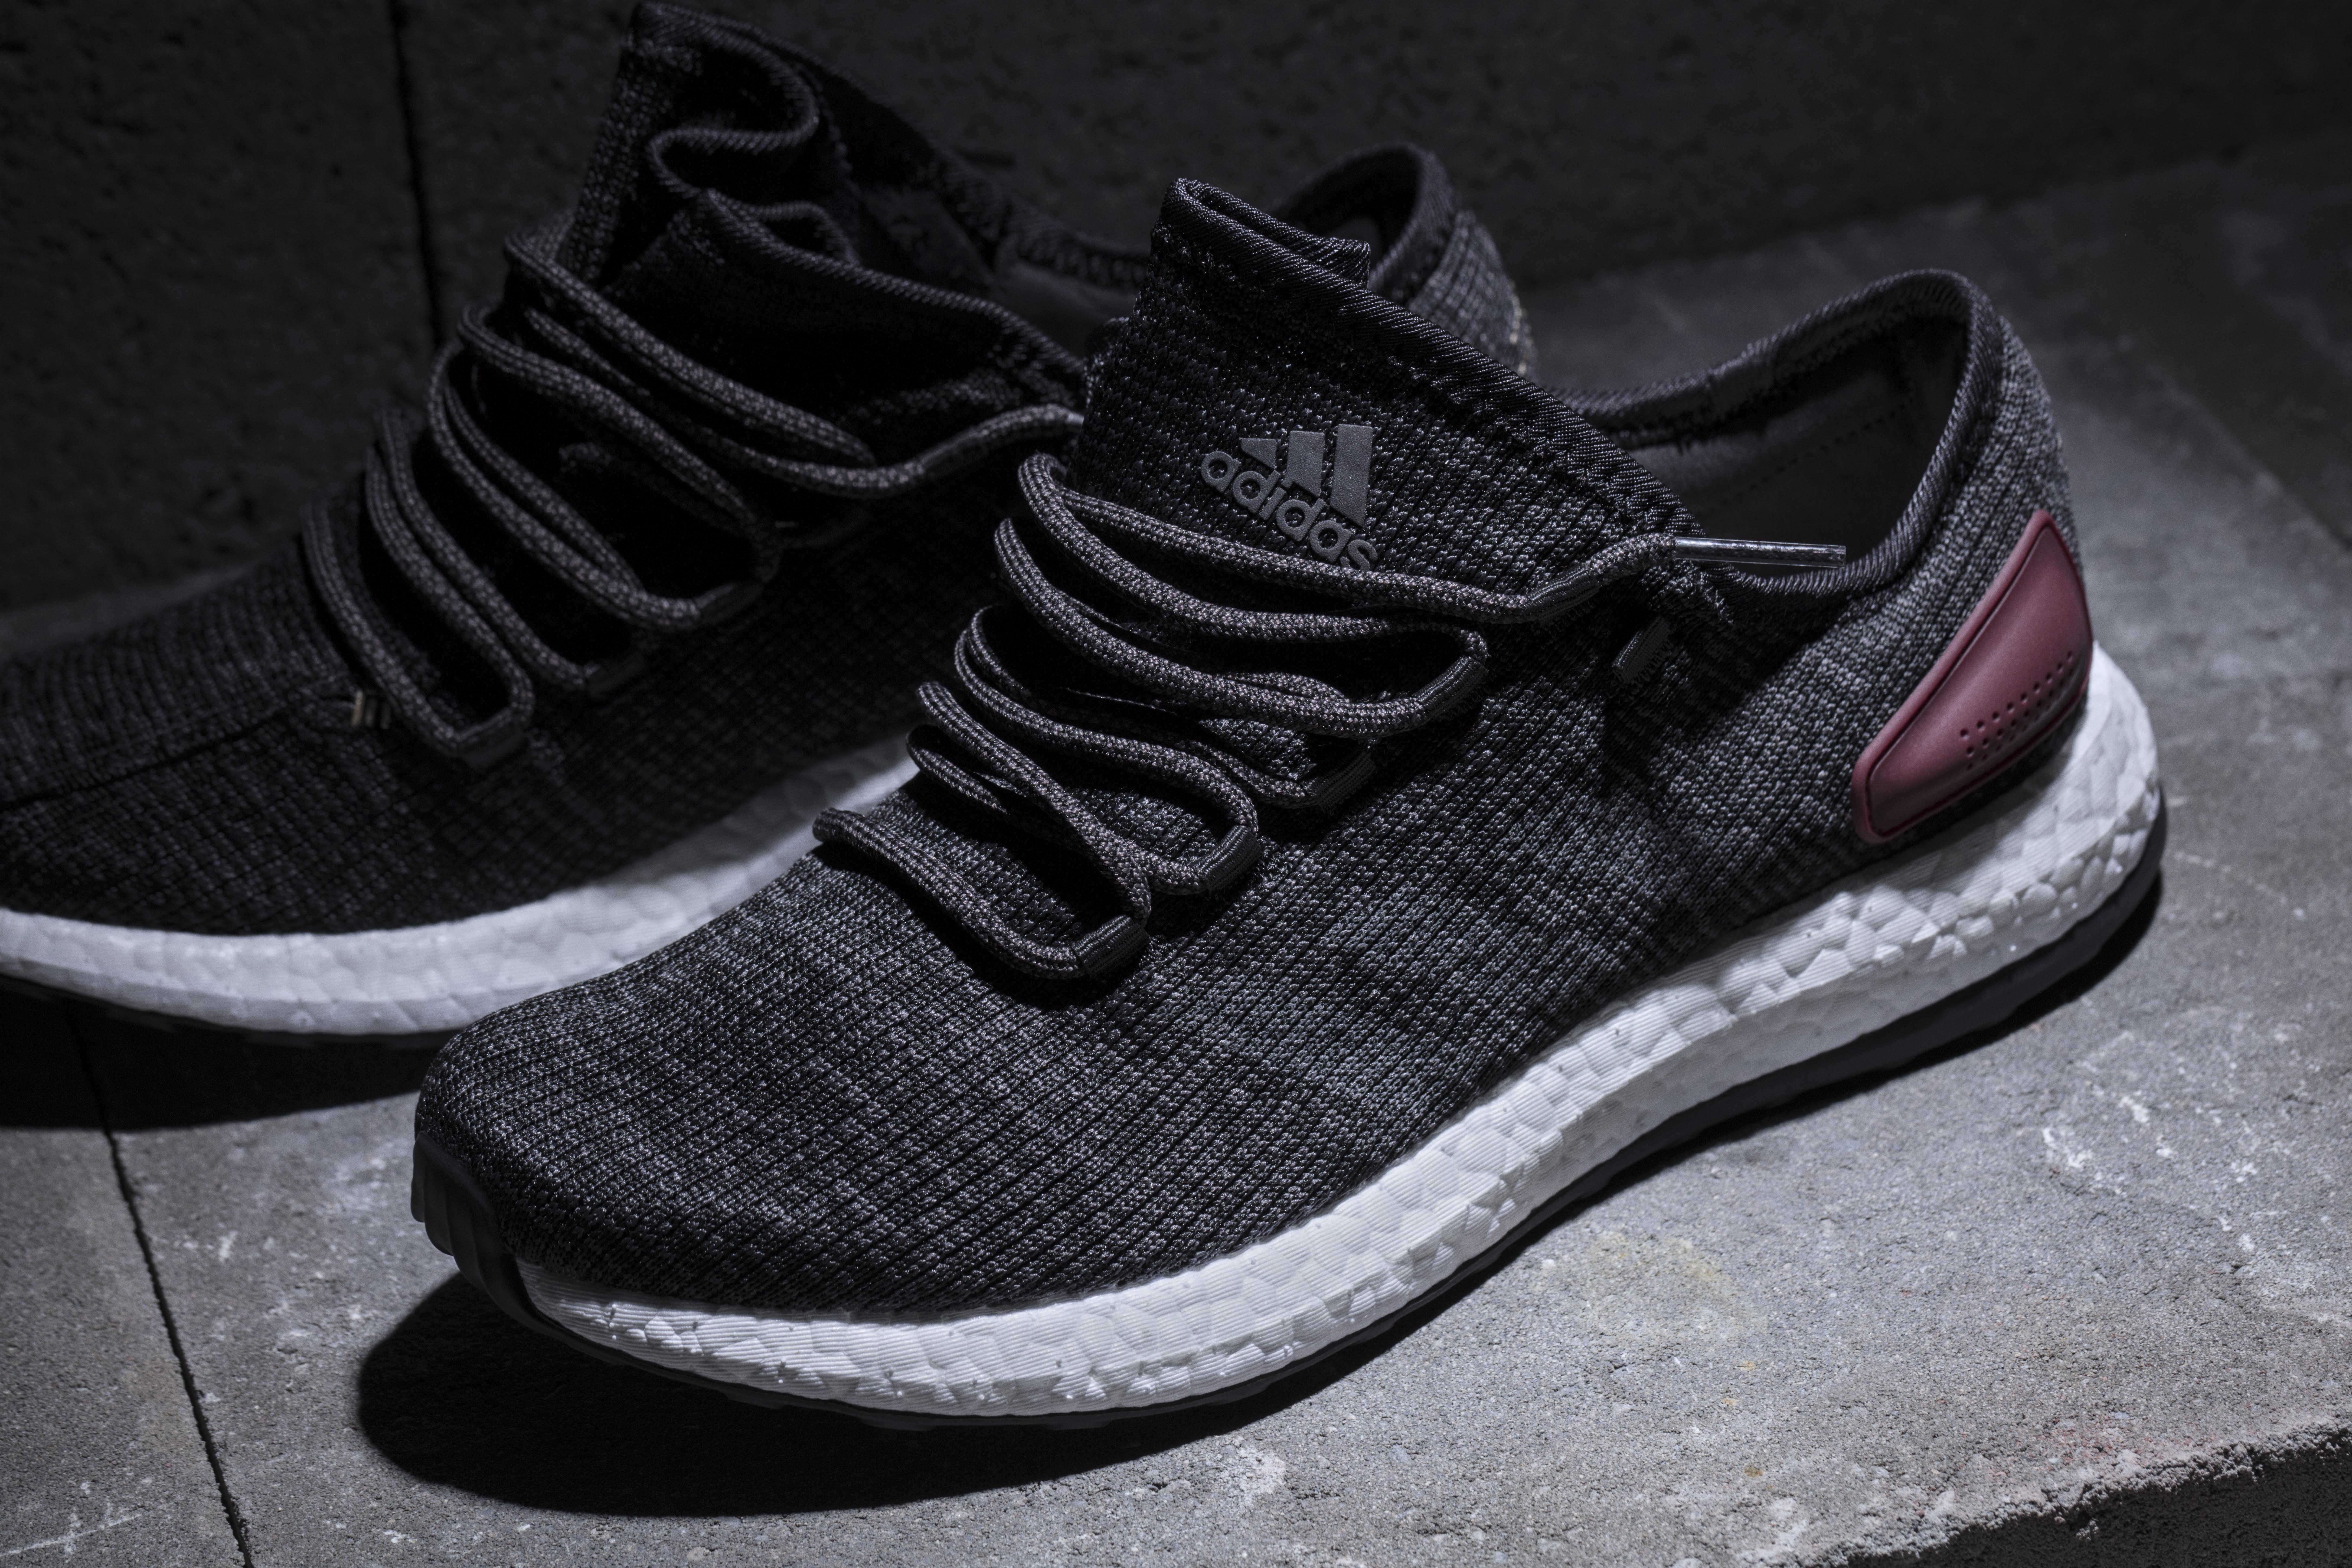 adidas pure boost uk 2017